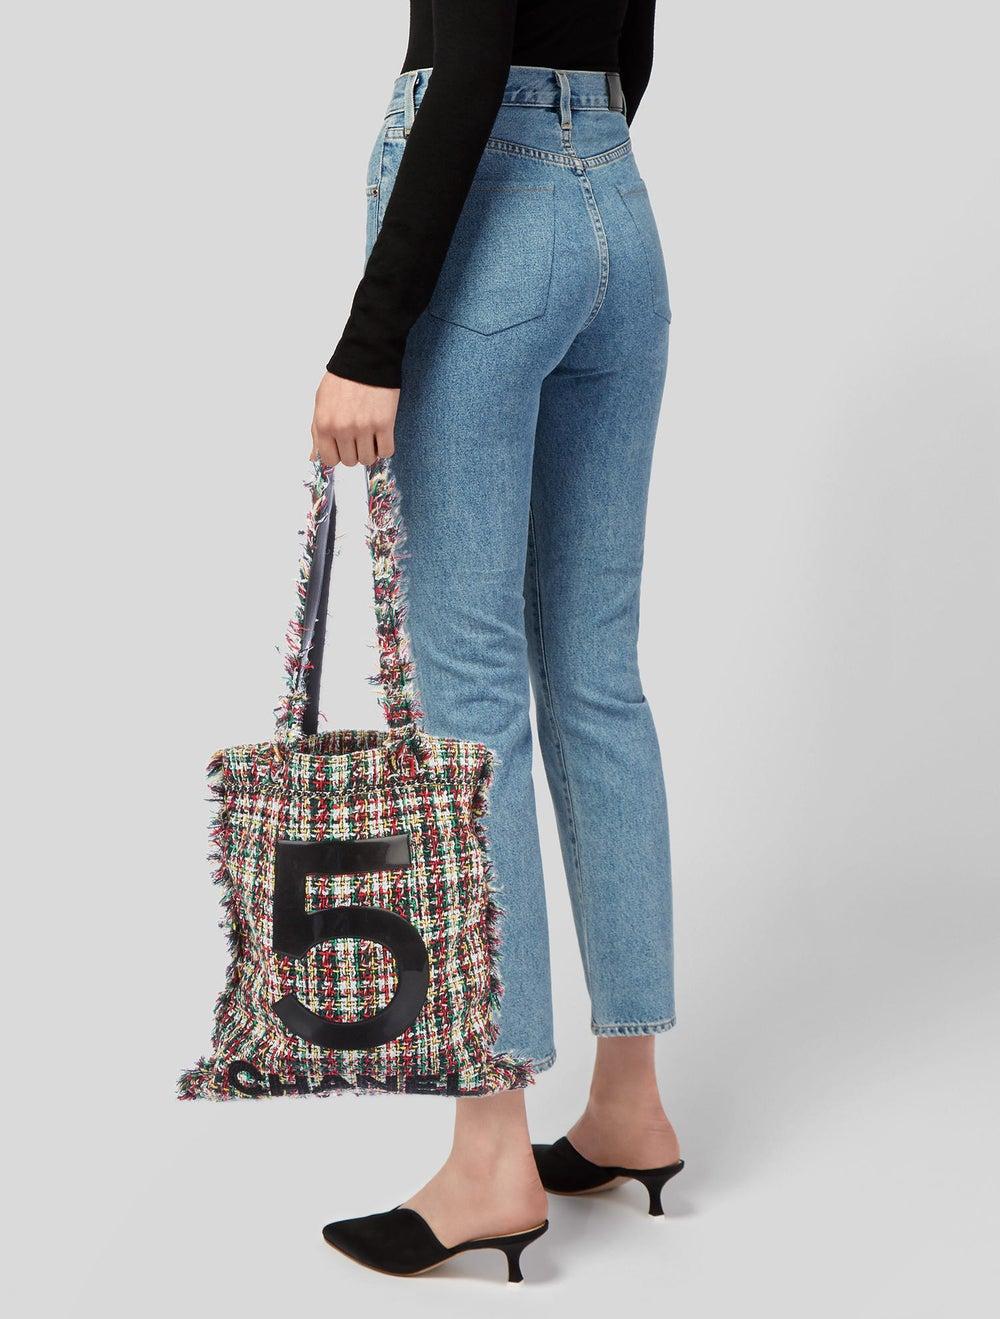 Chanel 2017 Large Tweed Shopping Bag White - image 2